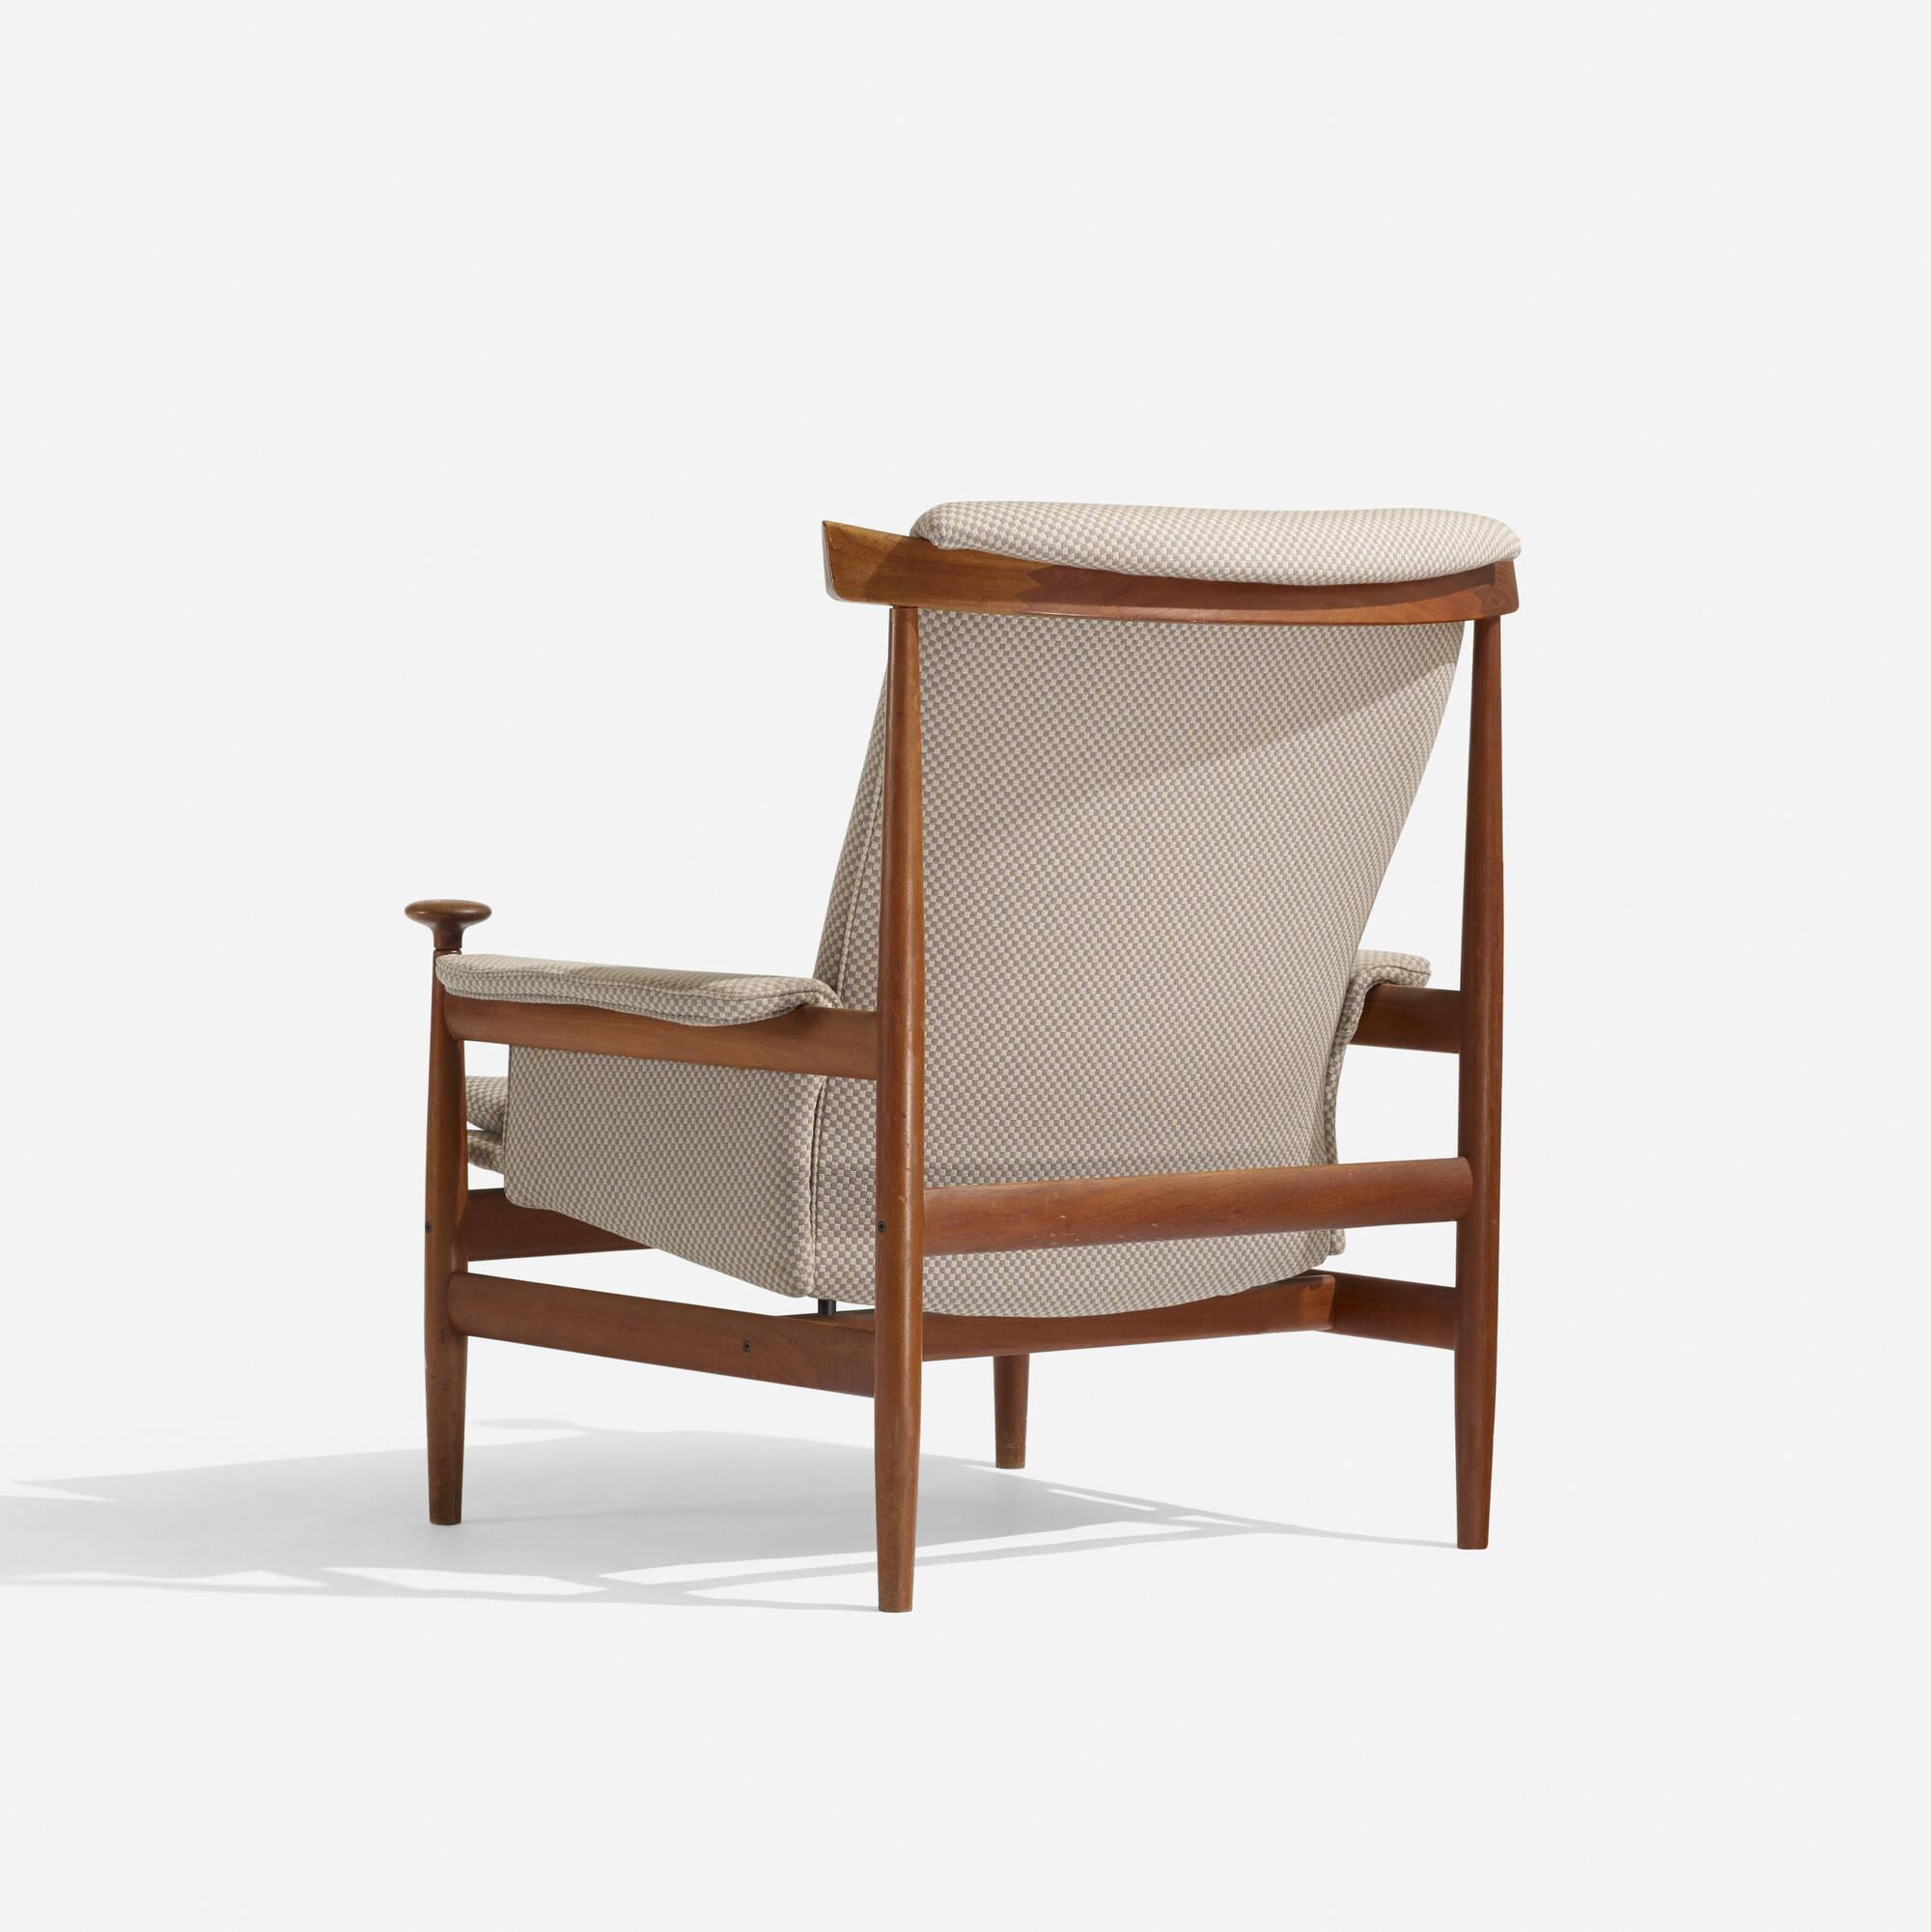 349: Finn Juhl / Bwana armchair (2 of 4)